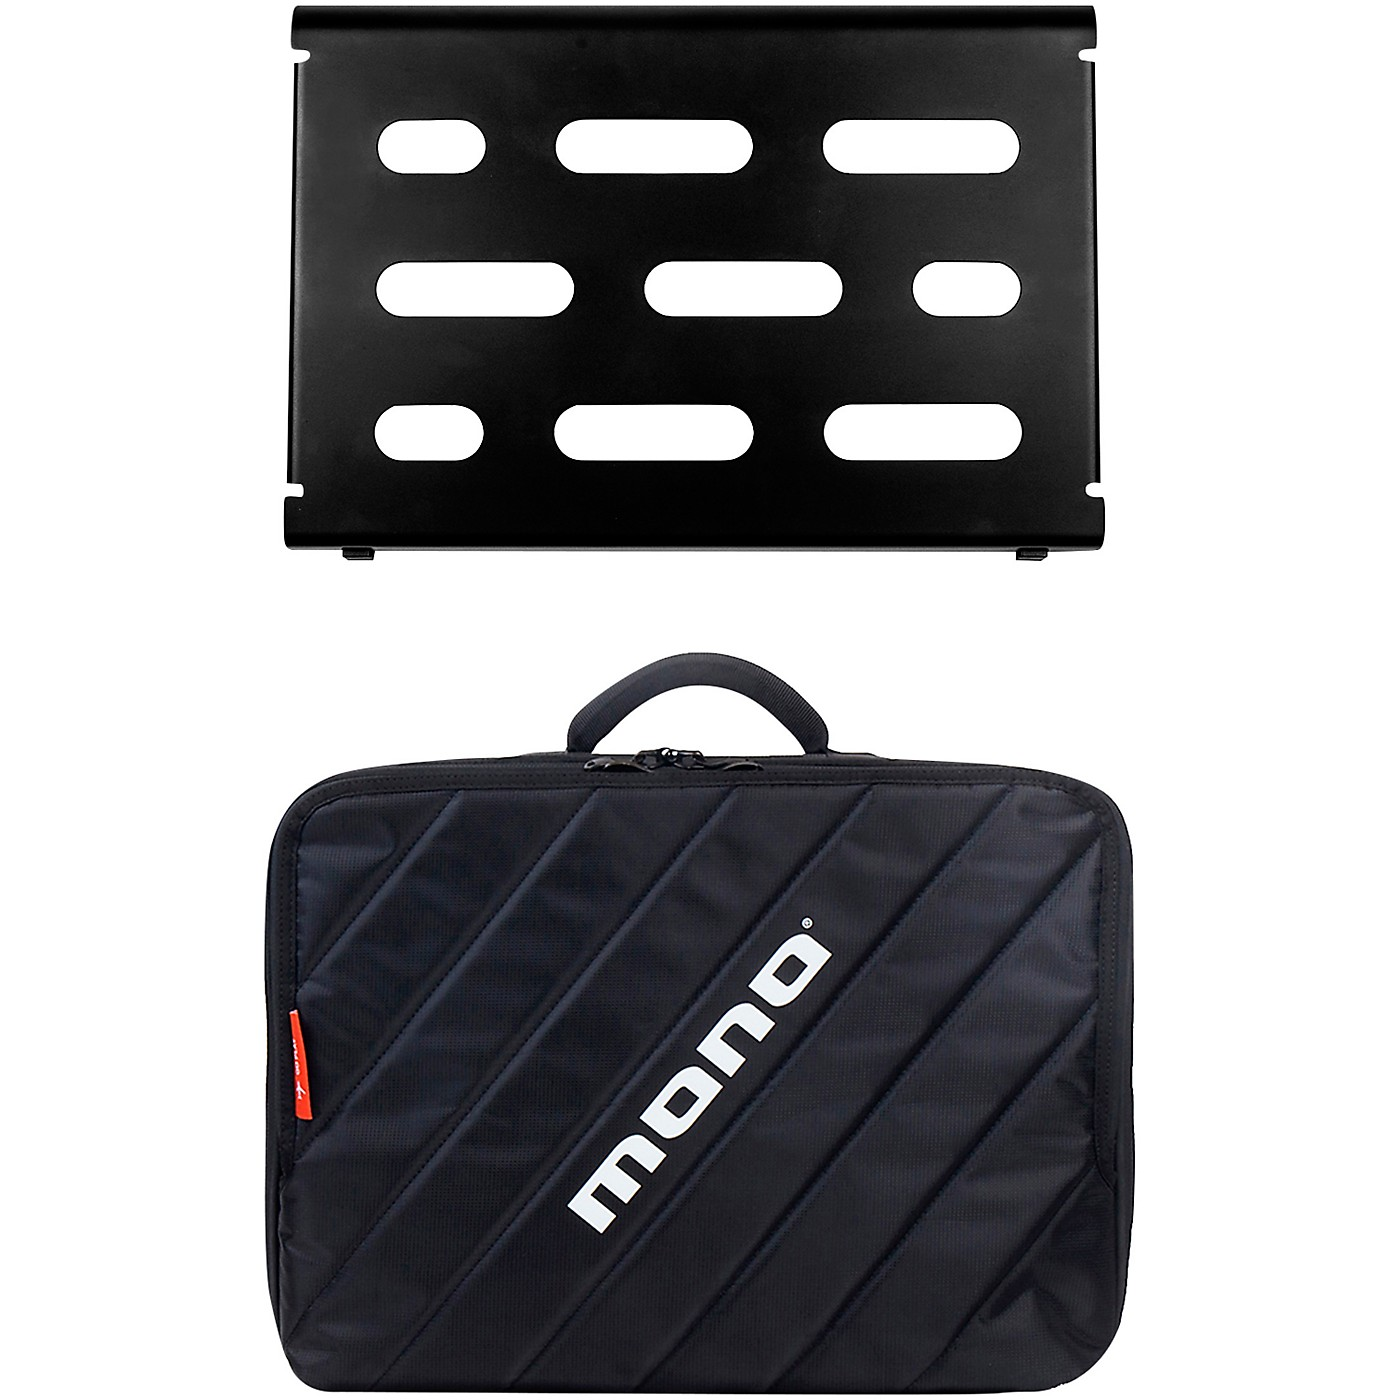 MONO Pedalboard Small, Black and Club Accessory Case 2.0, Black thumbnail